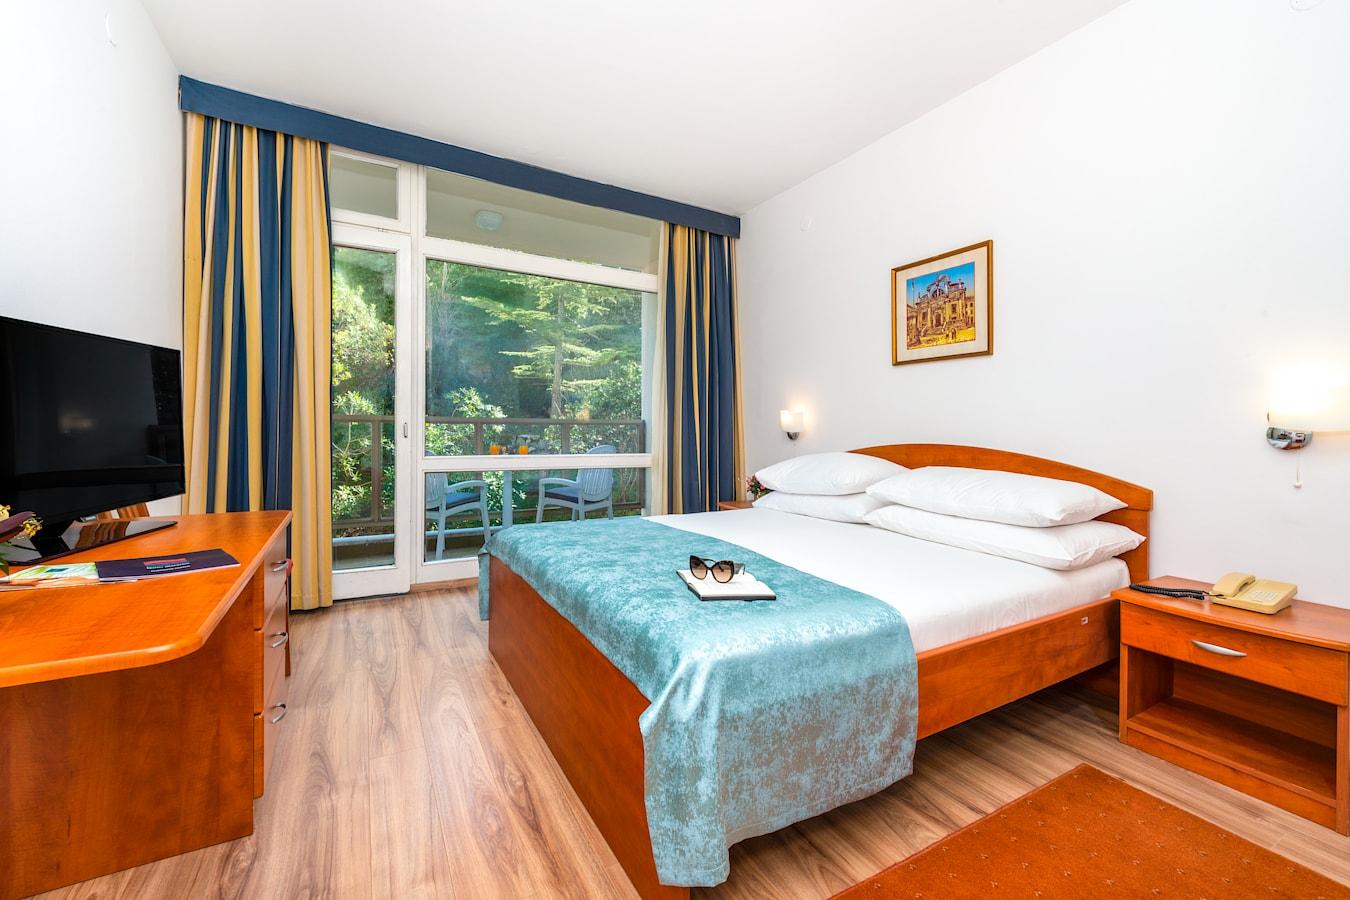 vis-hotel-dubrovnik-double-room-balcony-park-view.jpg